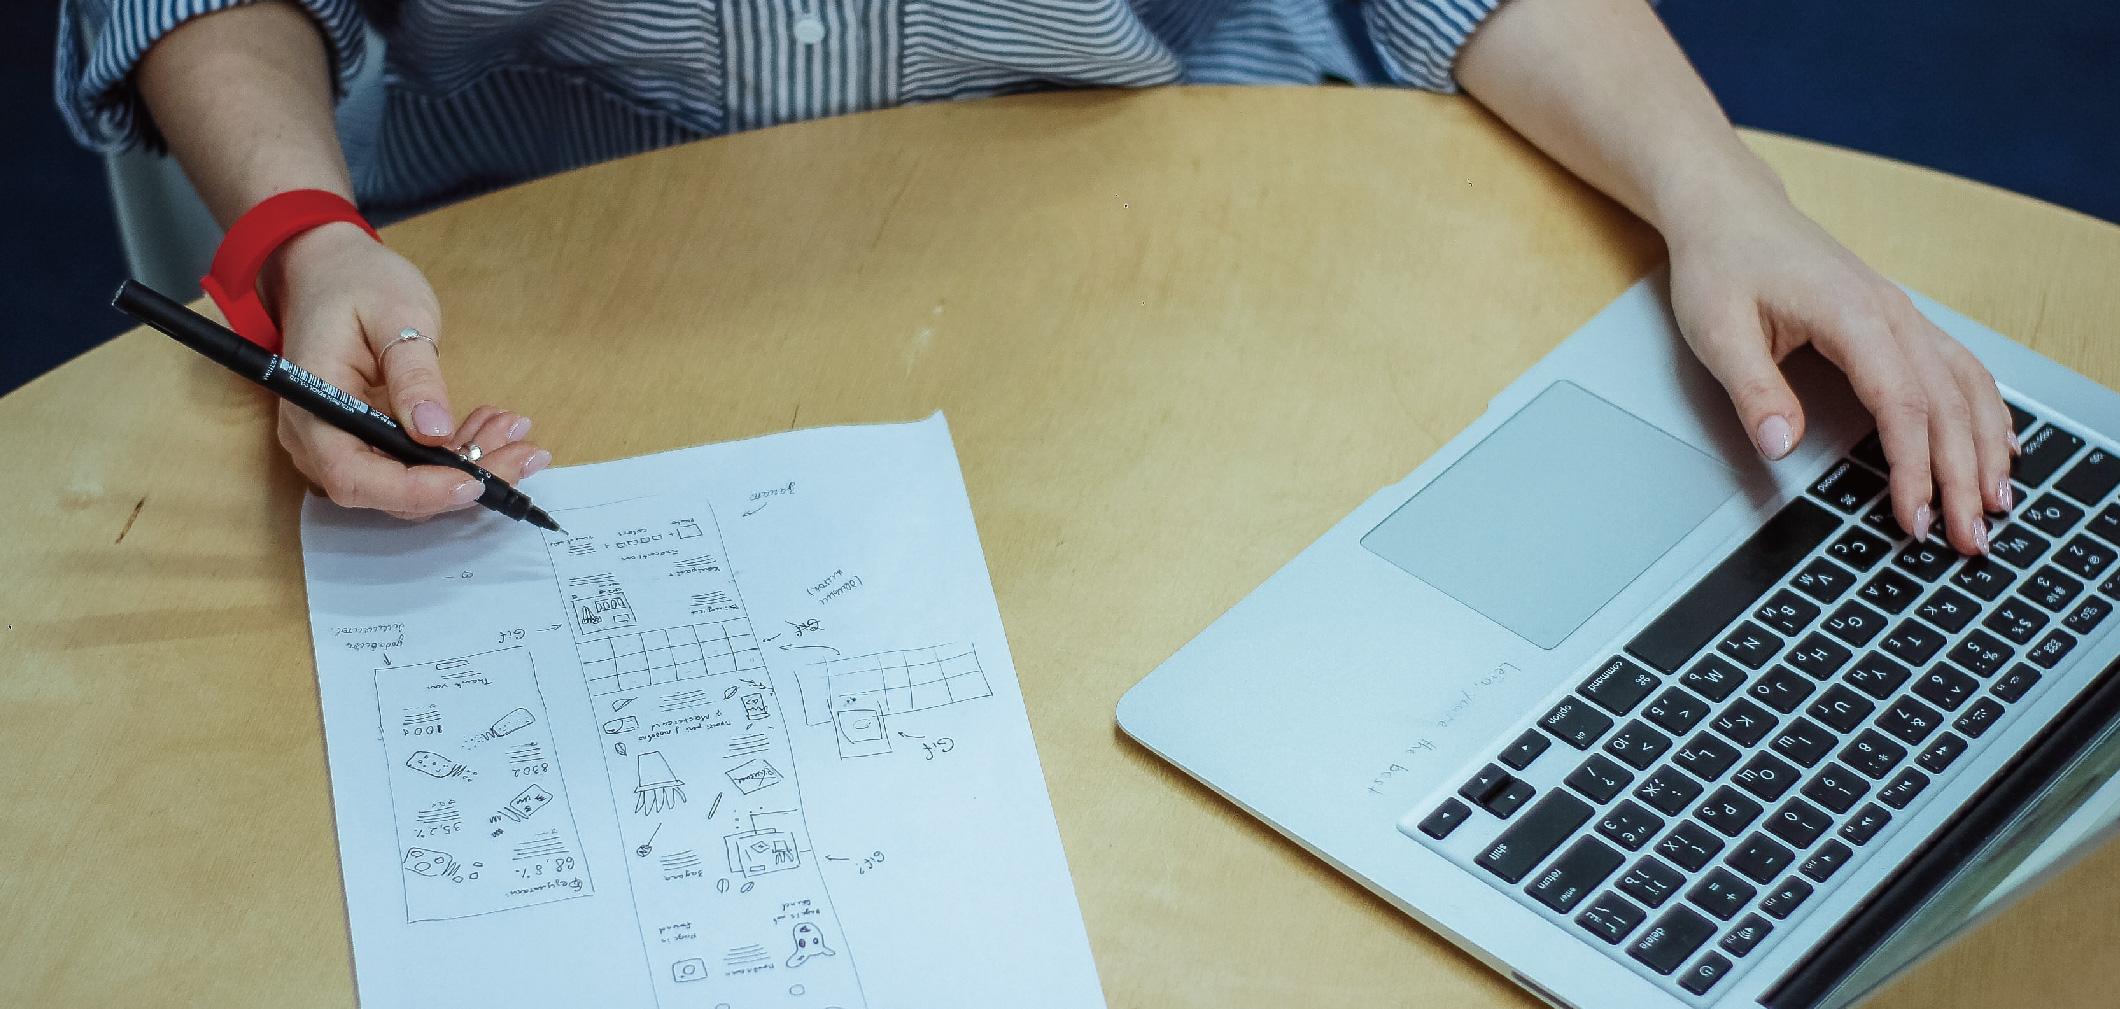 5 elements of graphic design